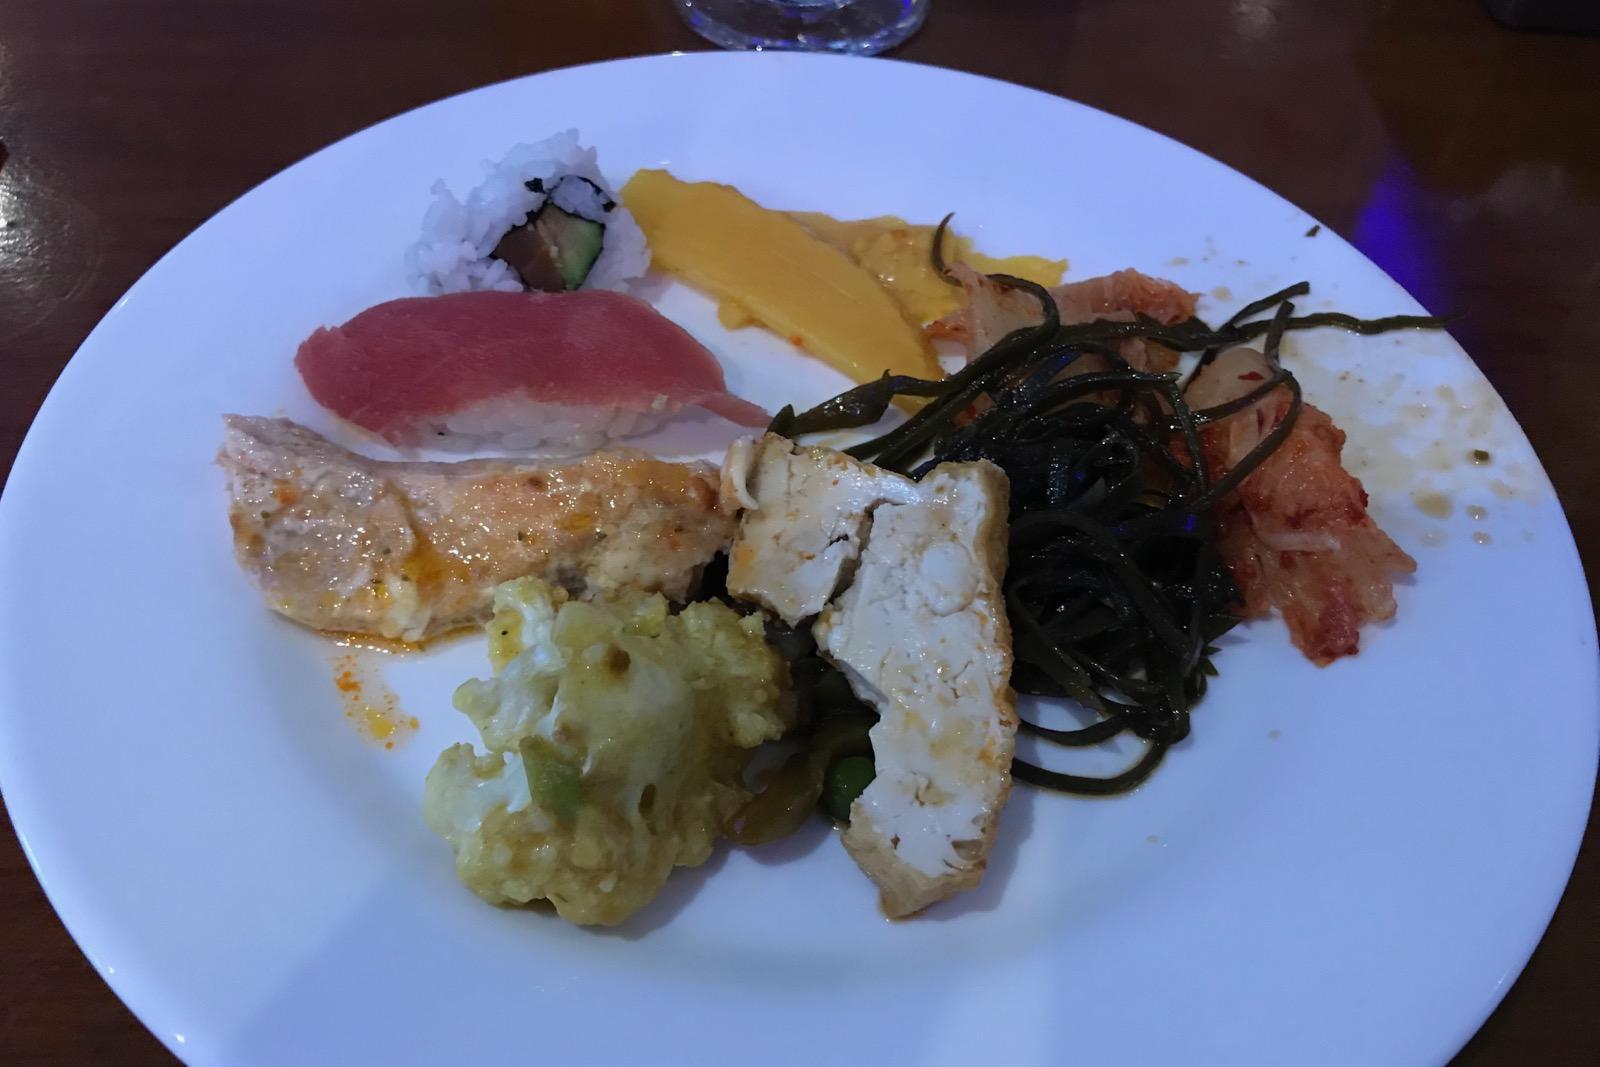 http://blog.rickk.com/food/2018/10/07/ate.2018.10.06.d1.jpg